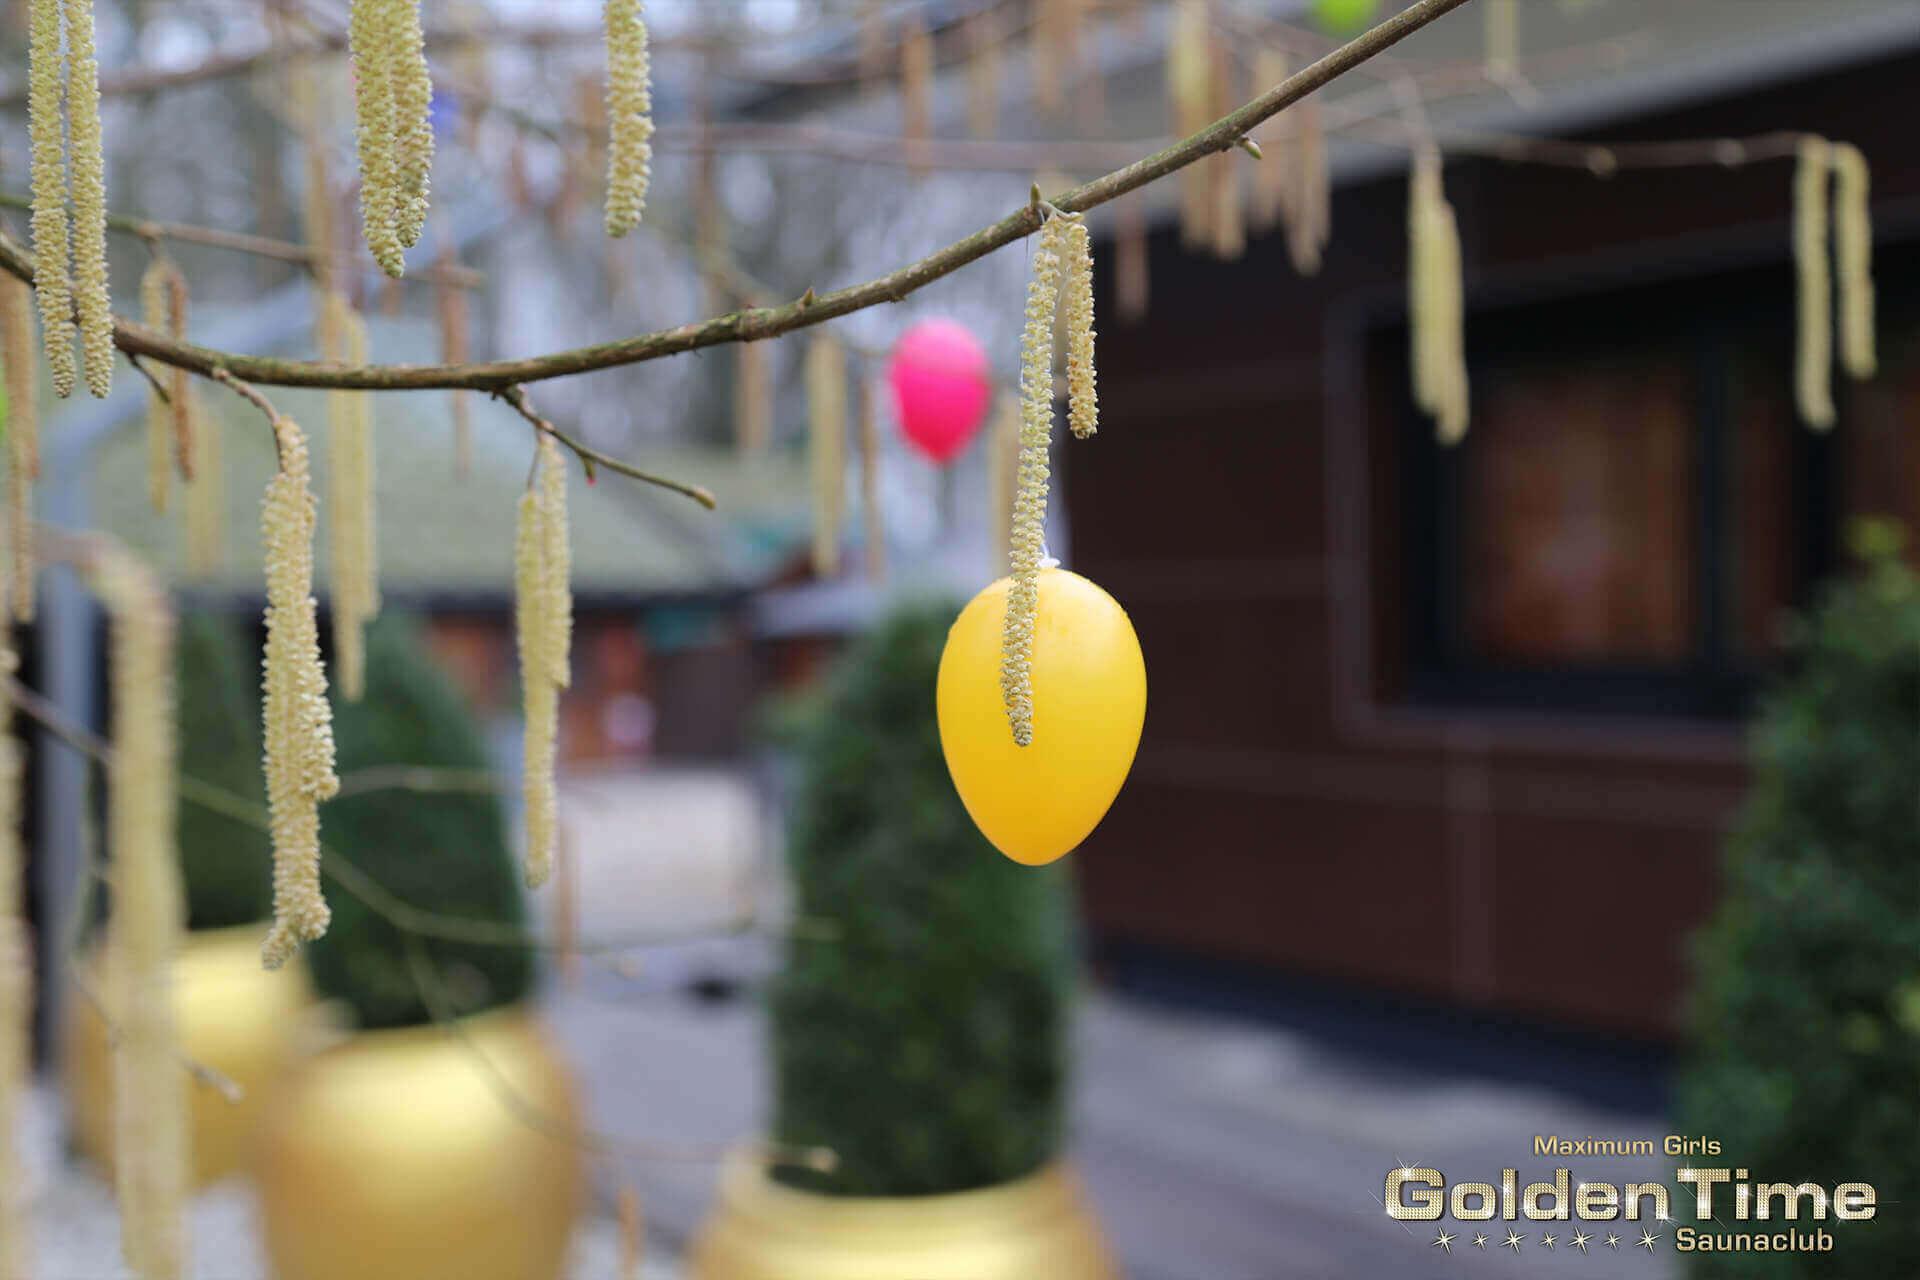 02-ostern-2016-pic-33-goldentime-saunaclub.jpg